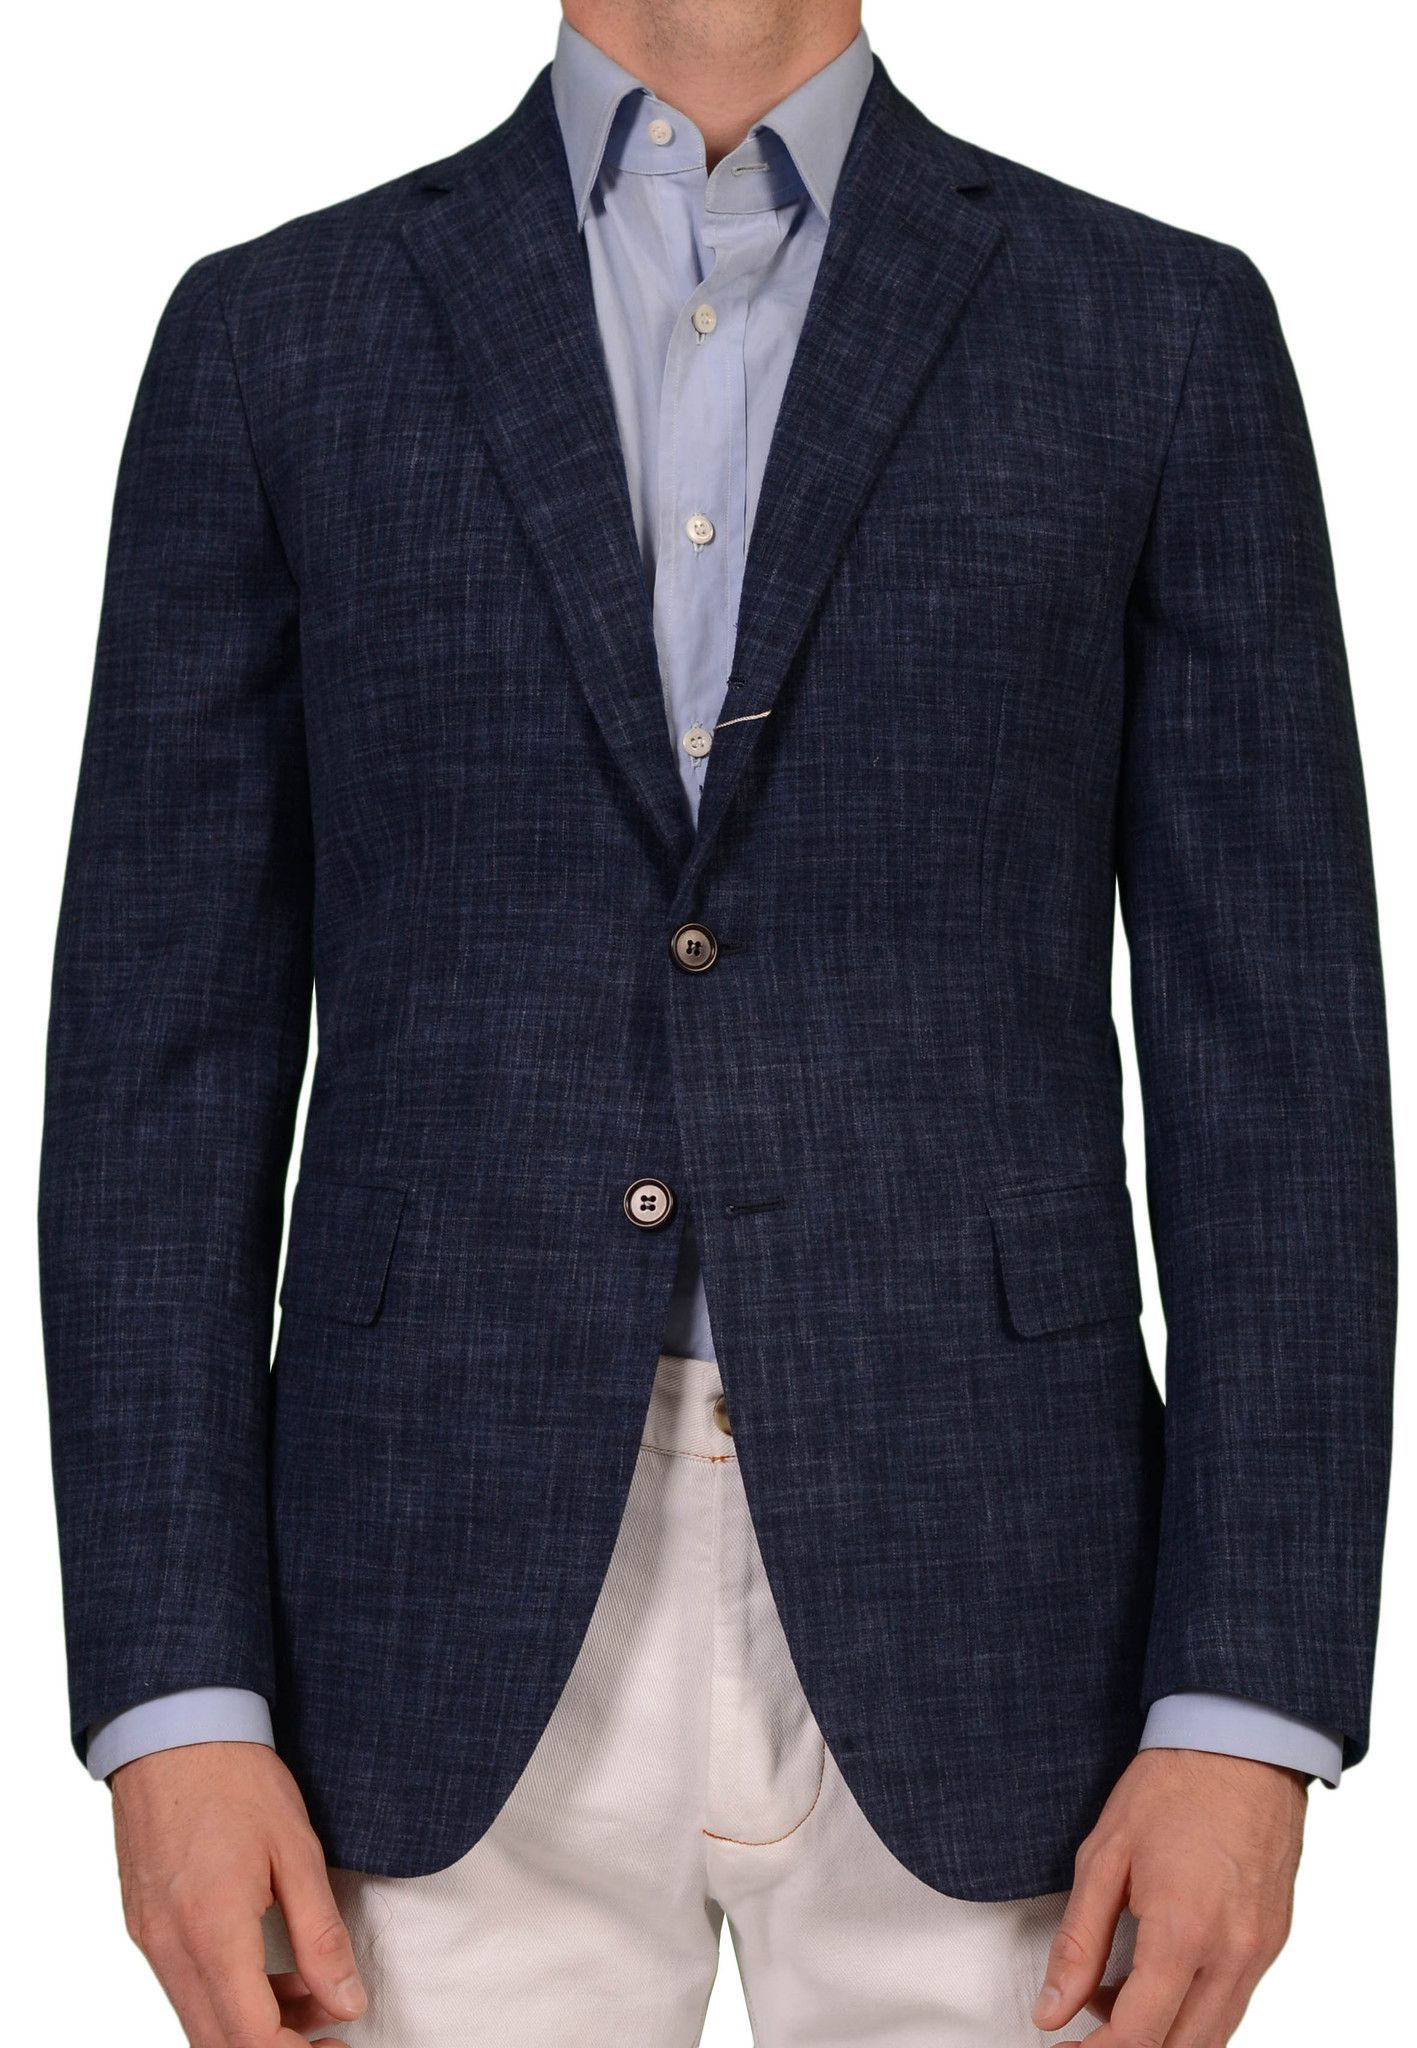 7e9a05ec5 Sartoria PARTENOPEA Hand Made Solid Blue Wool Flannel Blazer Jacket NEW R7